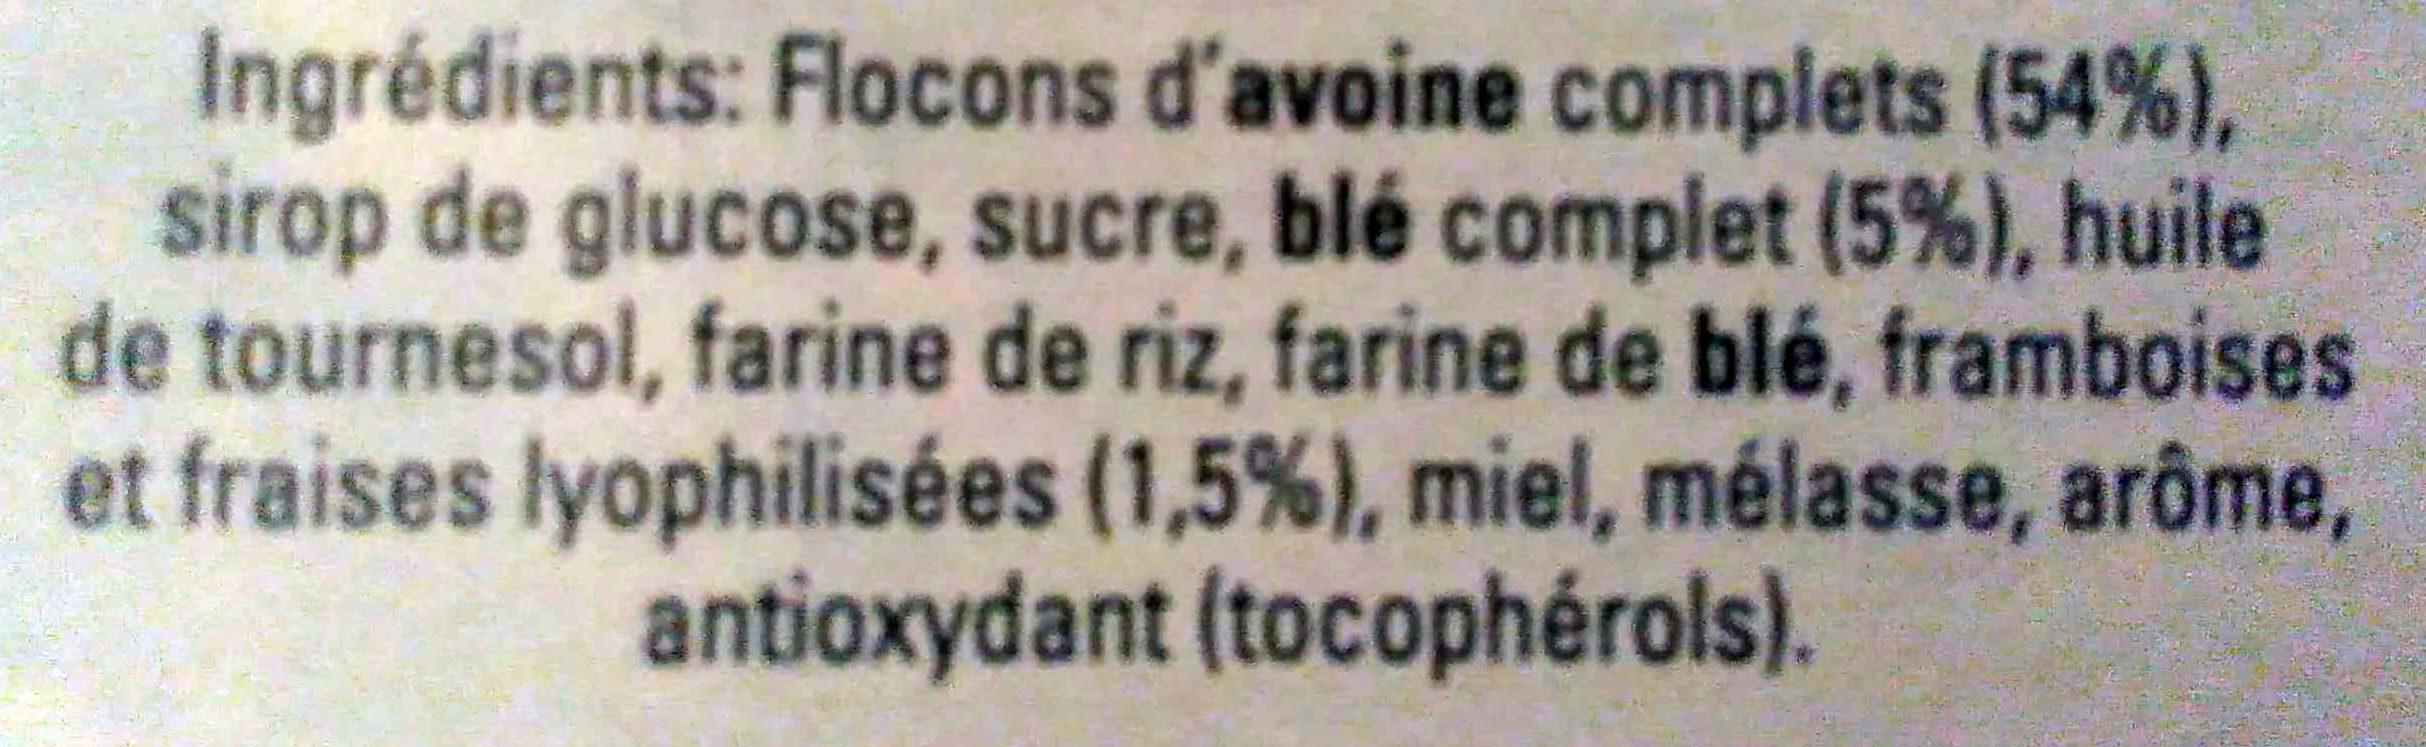 Havermout - Flocons d'avoine granola - Ingredienti - fr